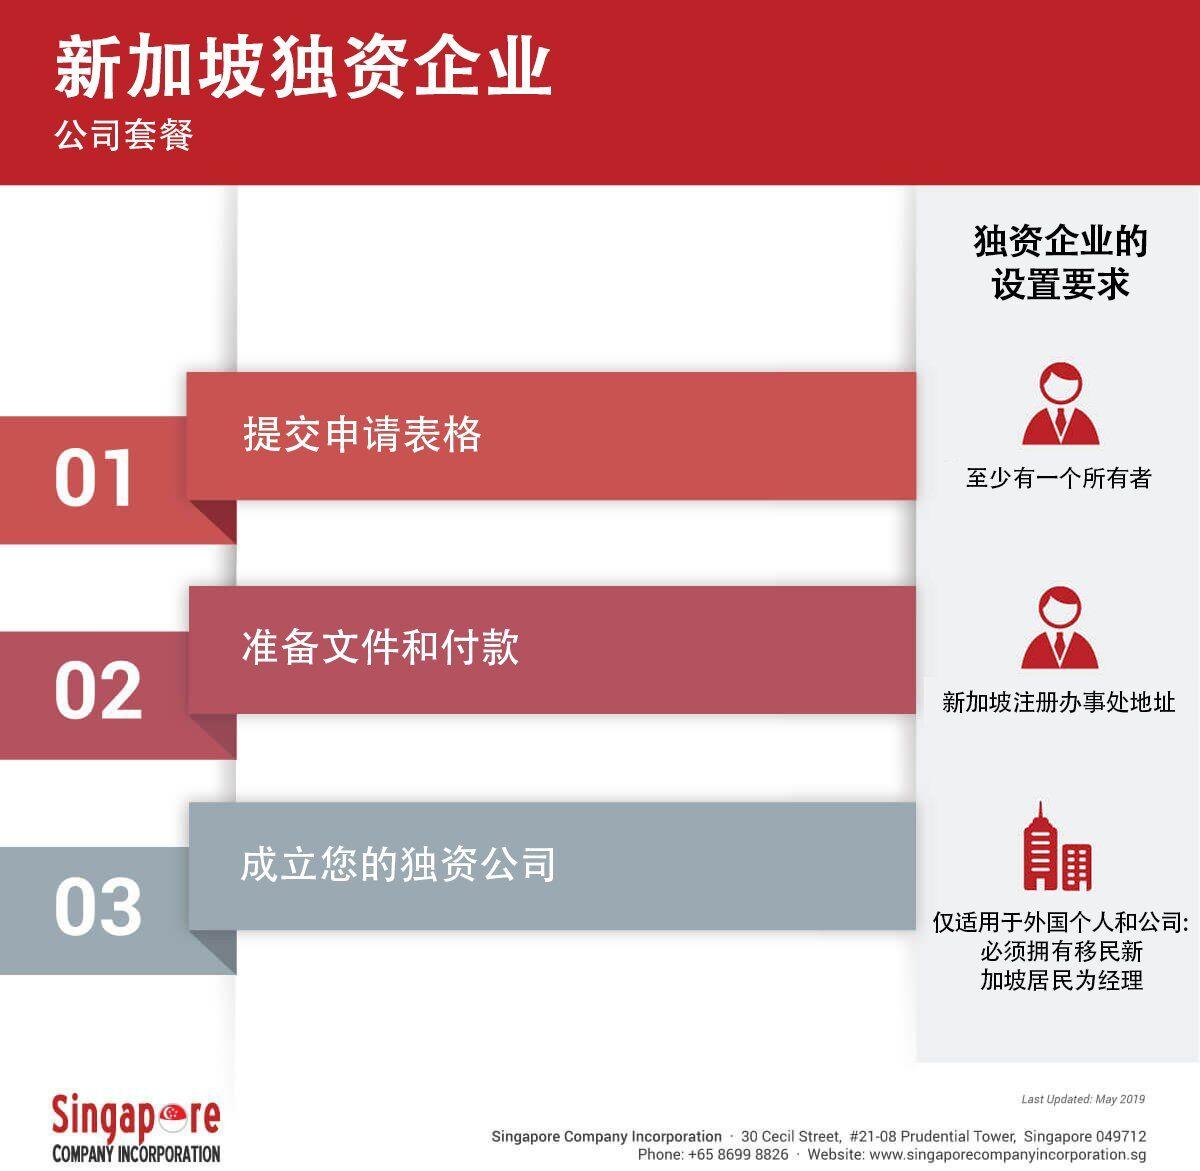 singapore-sole-proprietorship-ch 新加坡独资企业